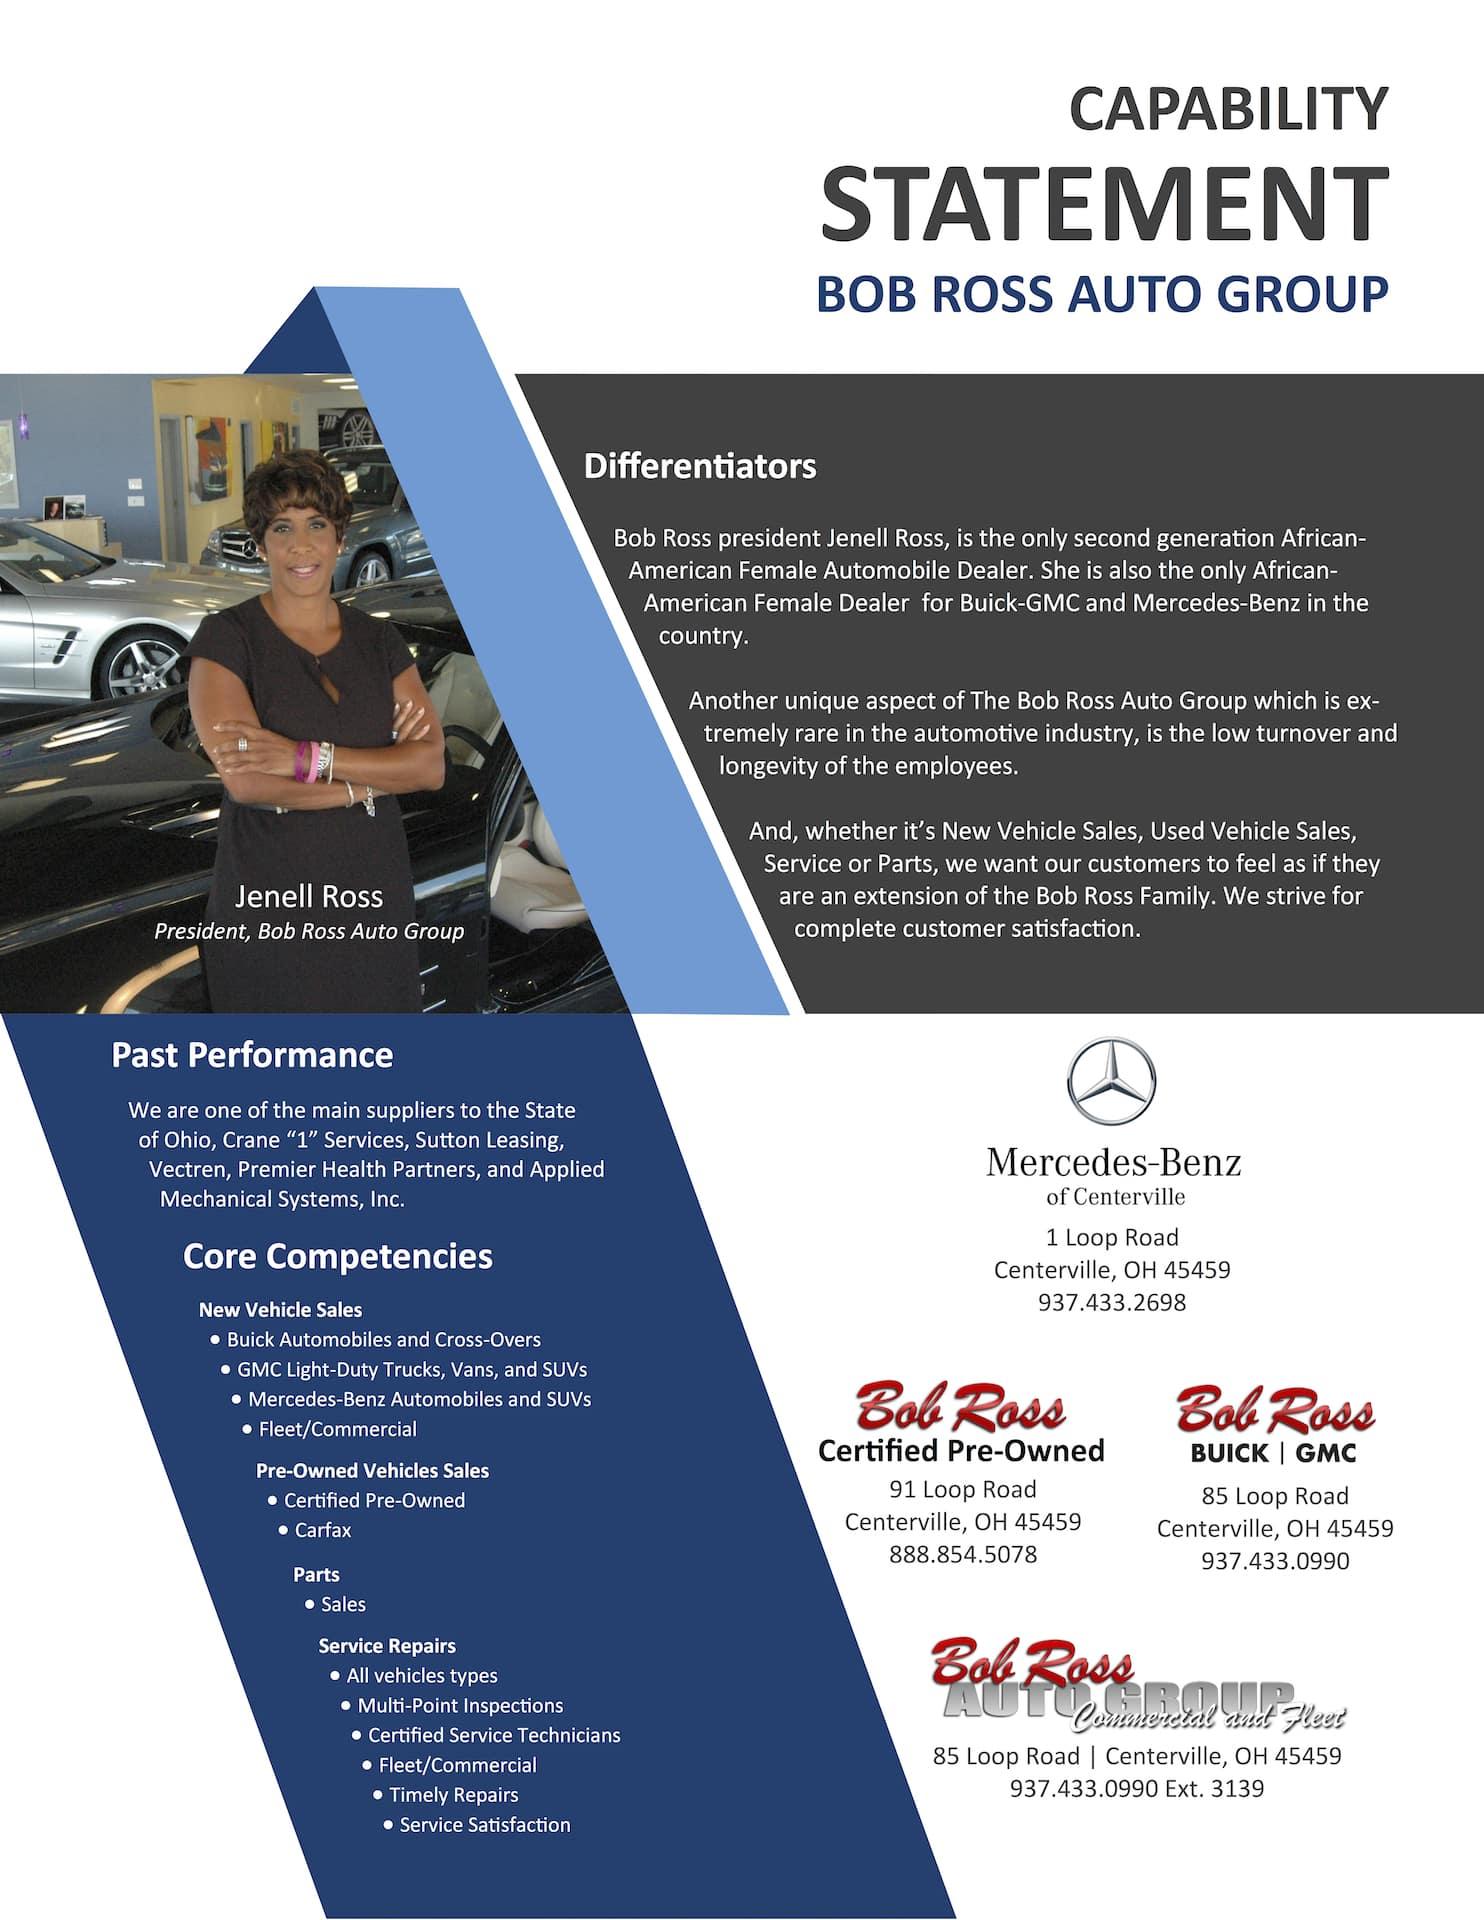 Bob Ross Buick GMC Capability Statement